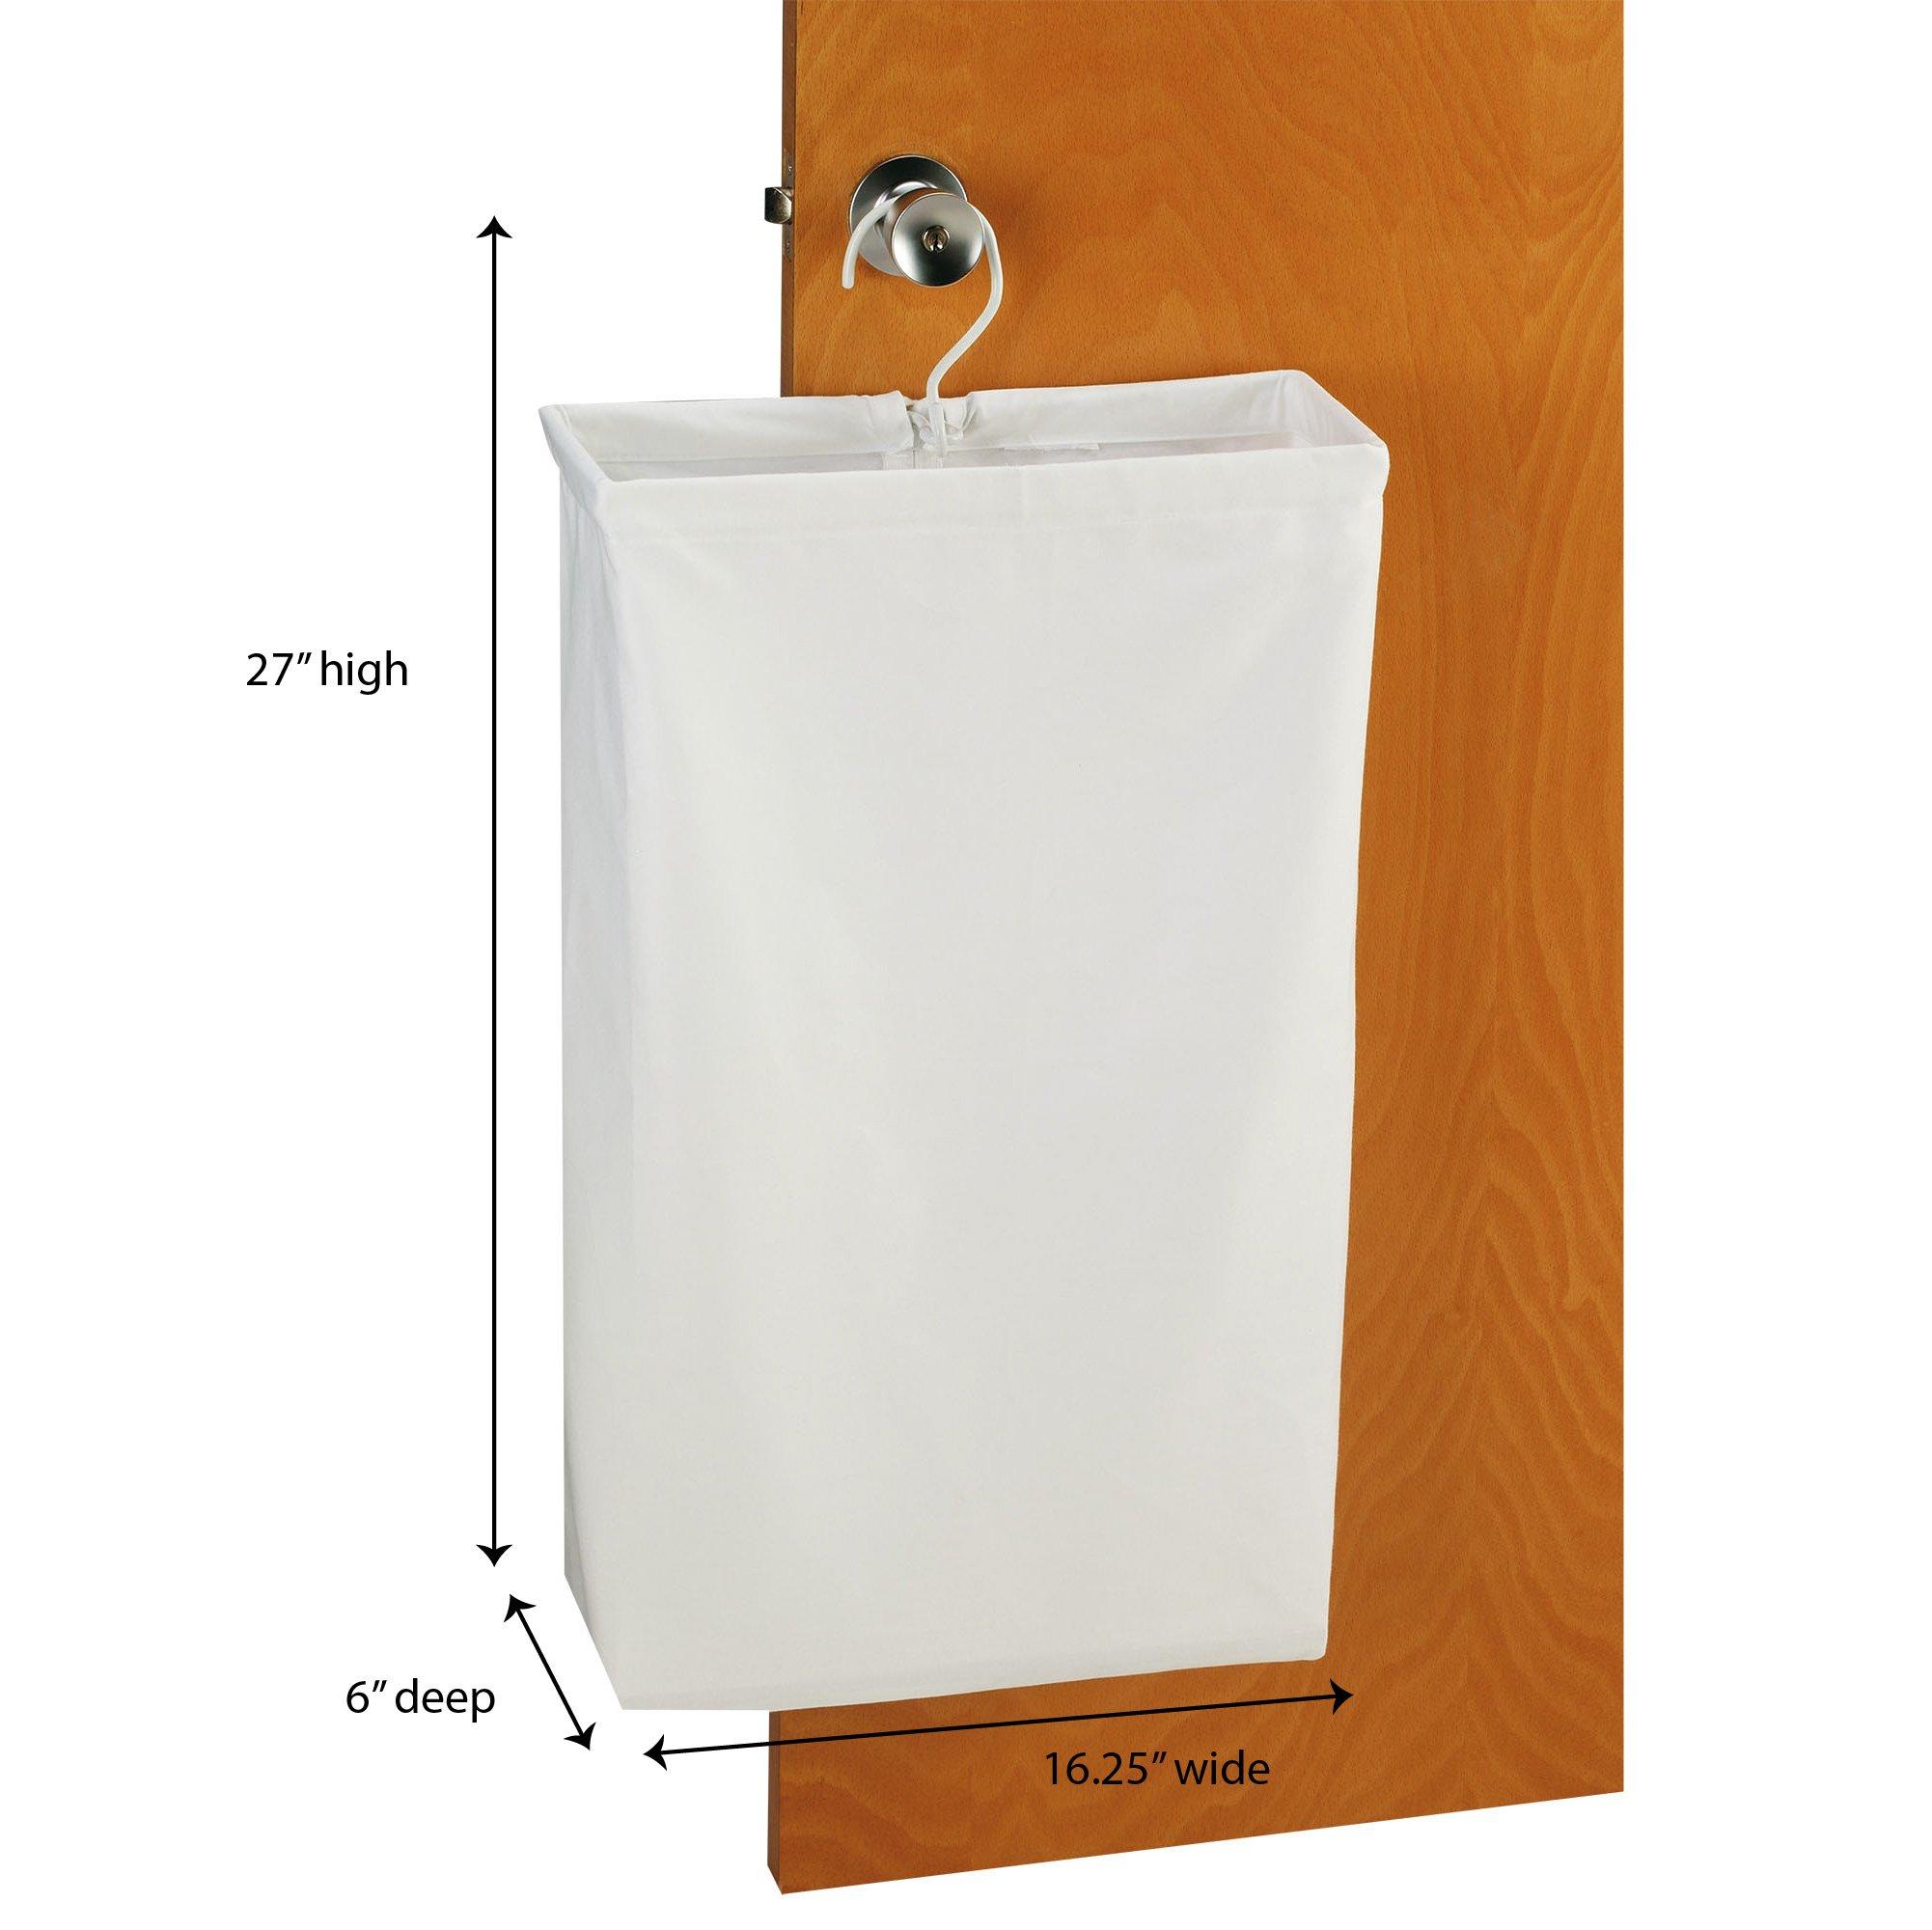 Household Essentials 148 Hanging Cotton Canvas Laundry Hamper Bag | White by Household Essentials (Image #1)